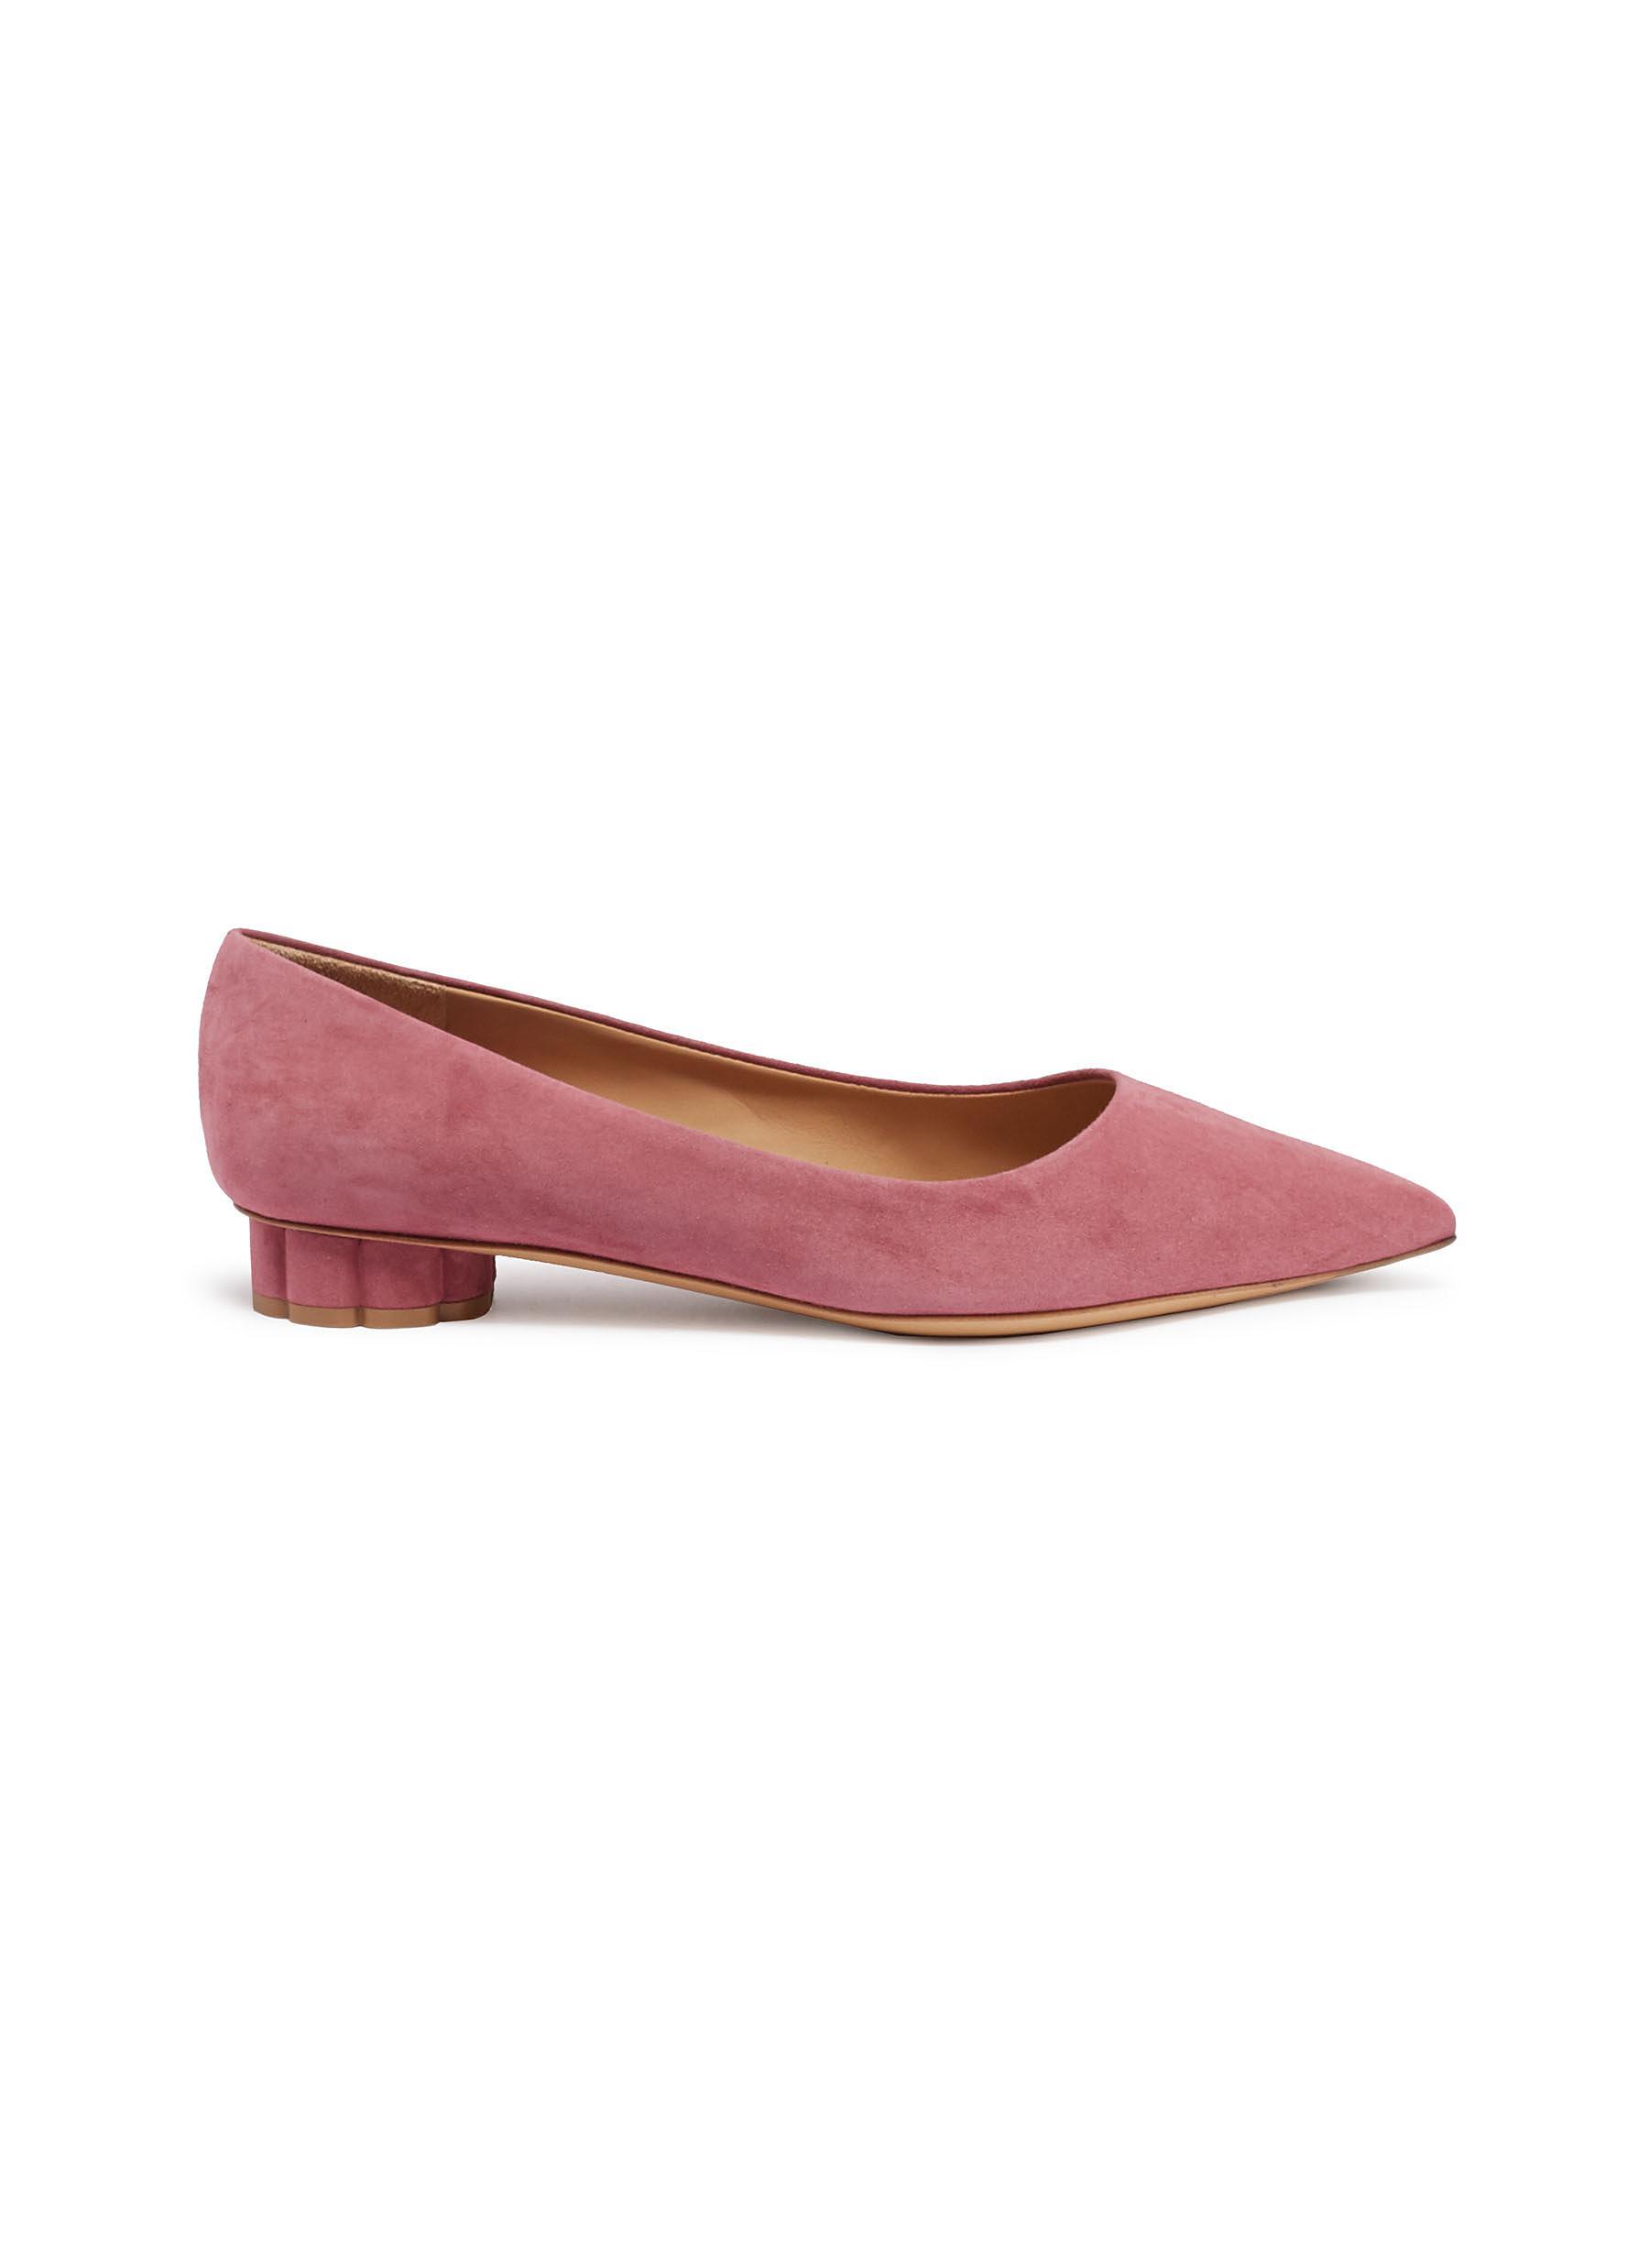 Salvatore Ferragamo Badia Flower Heel Suede Flats Women Lane